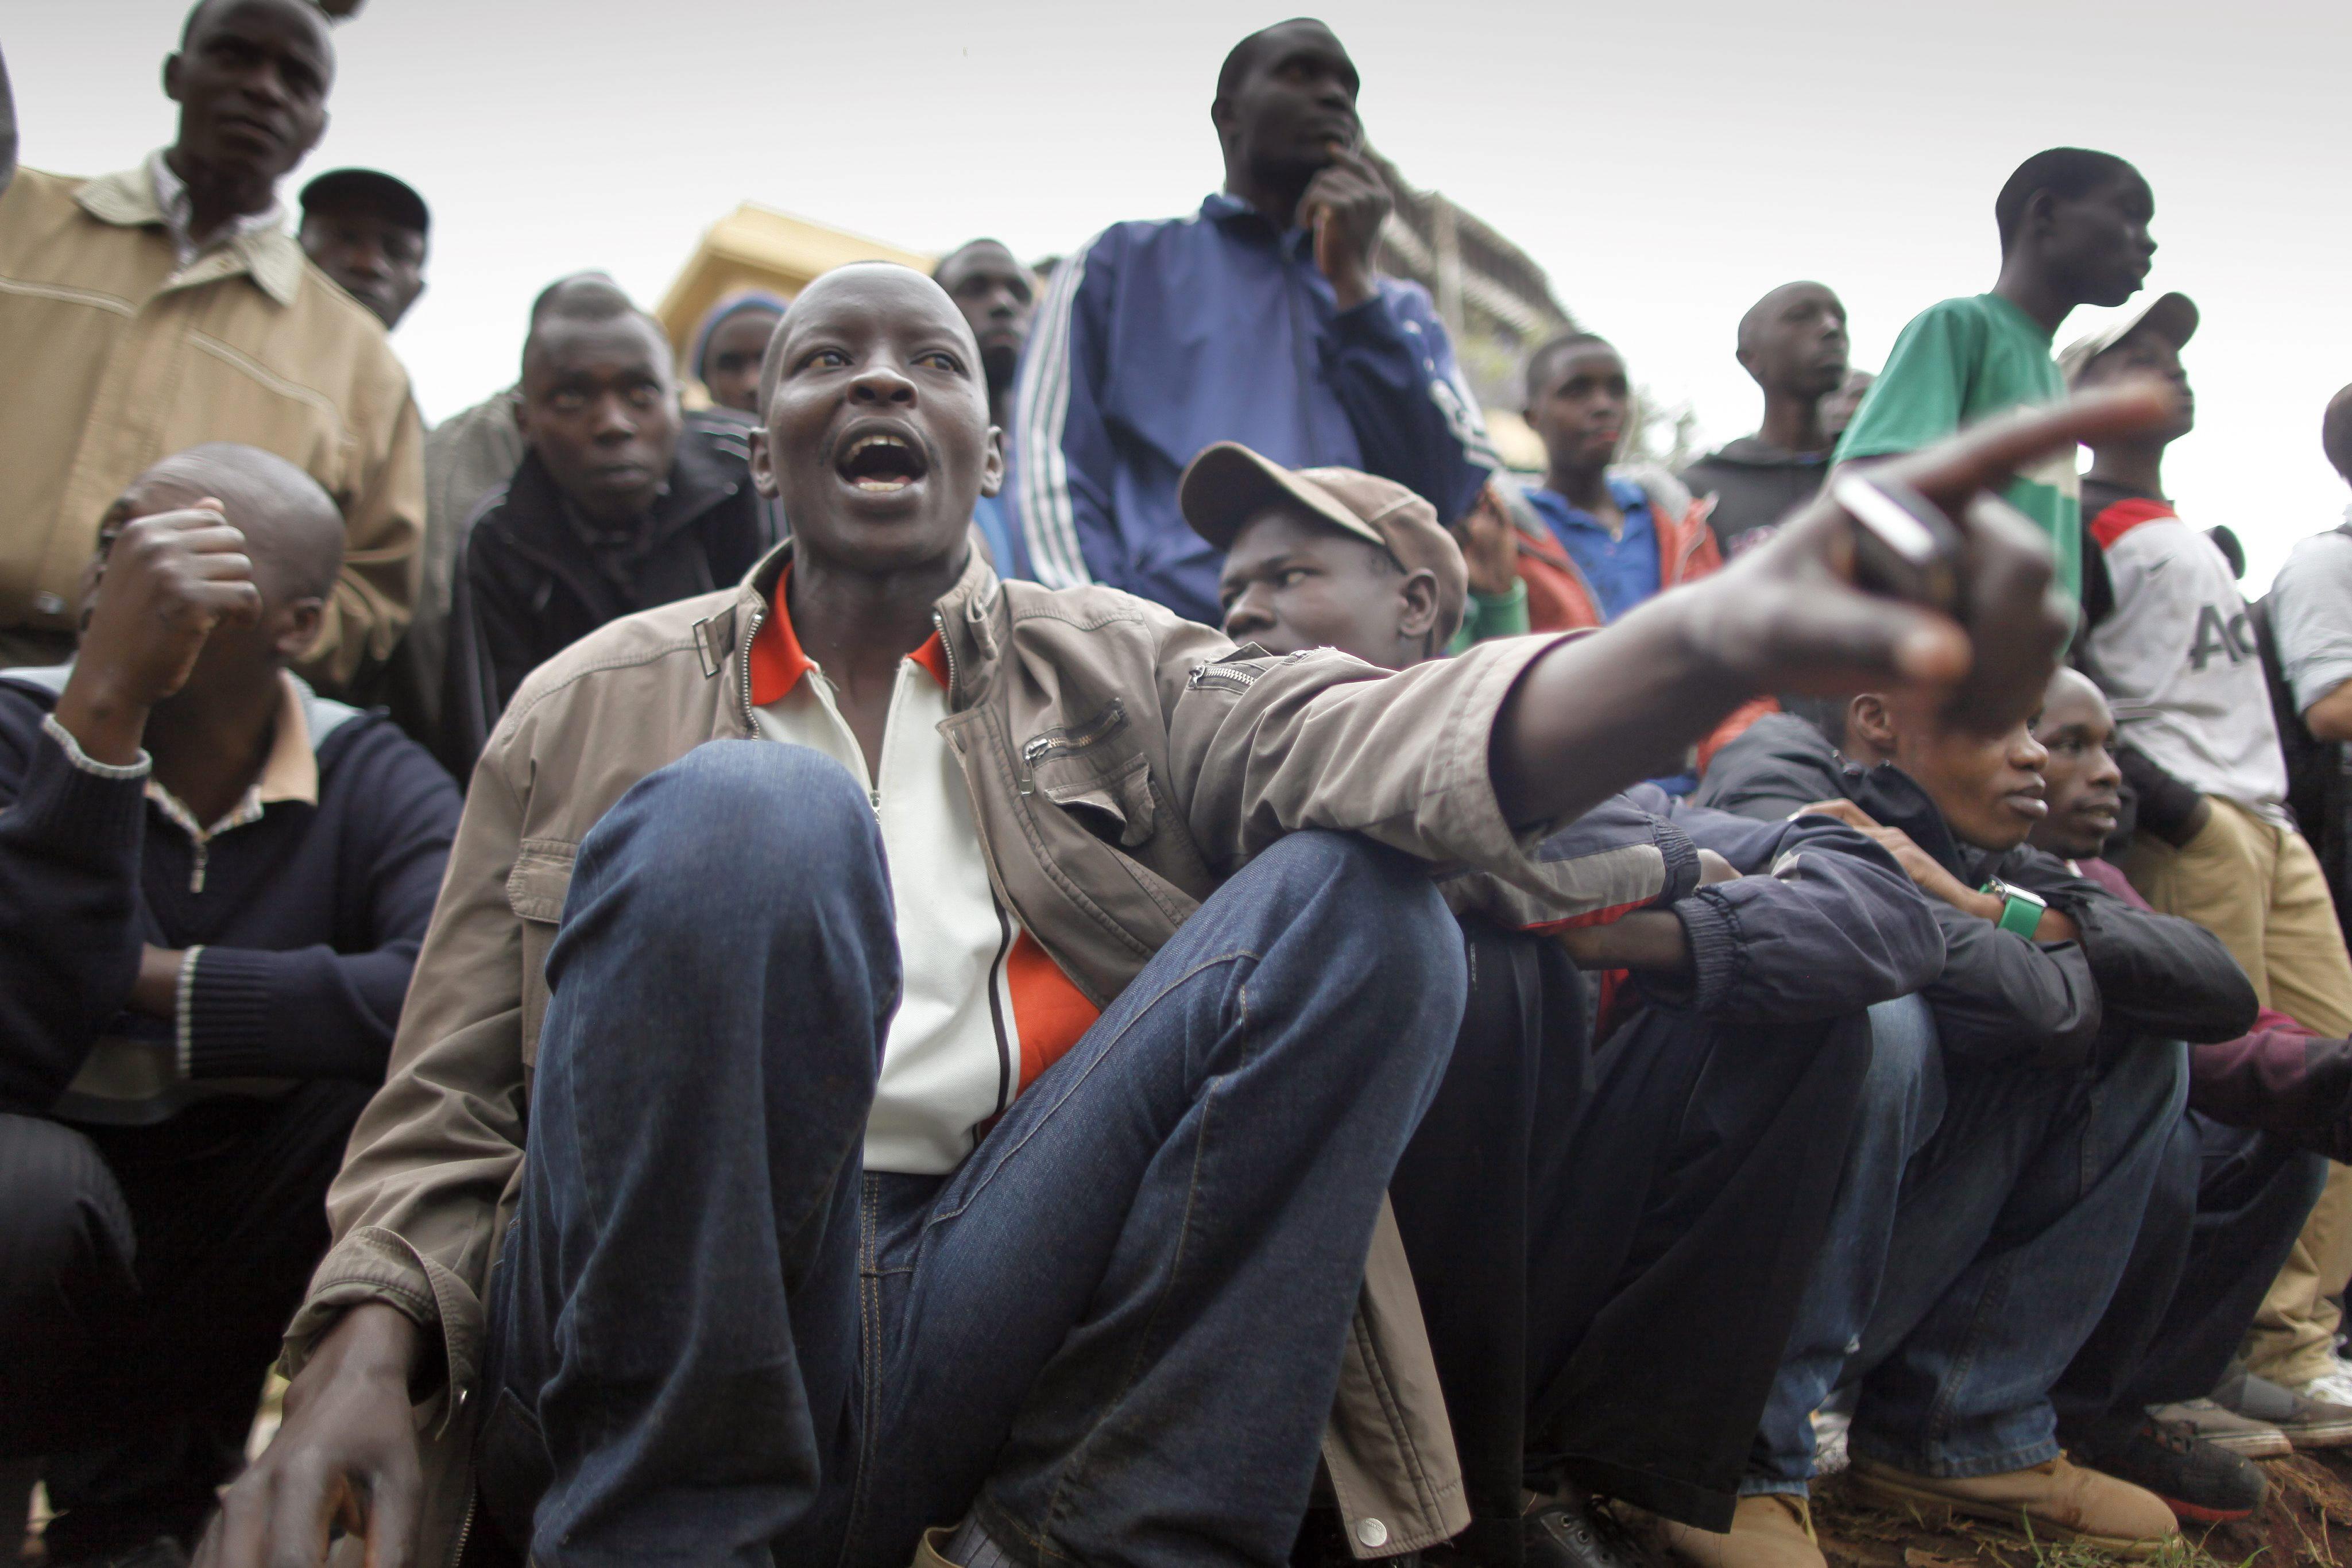 África se convierte en un nido de grupos armados que apuntan a Occidente